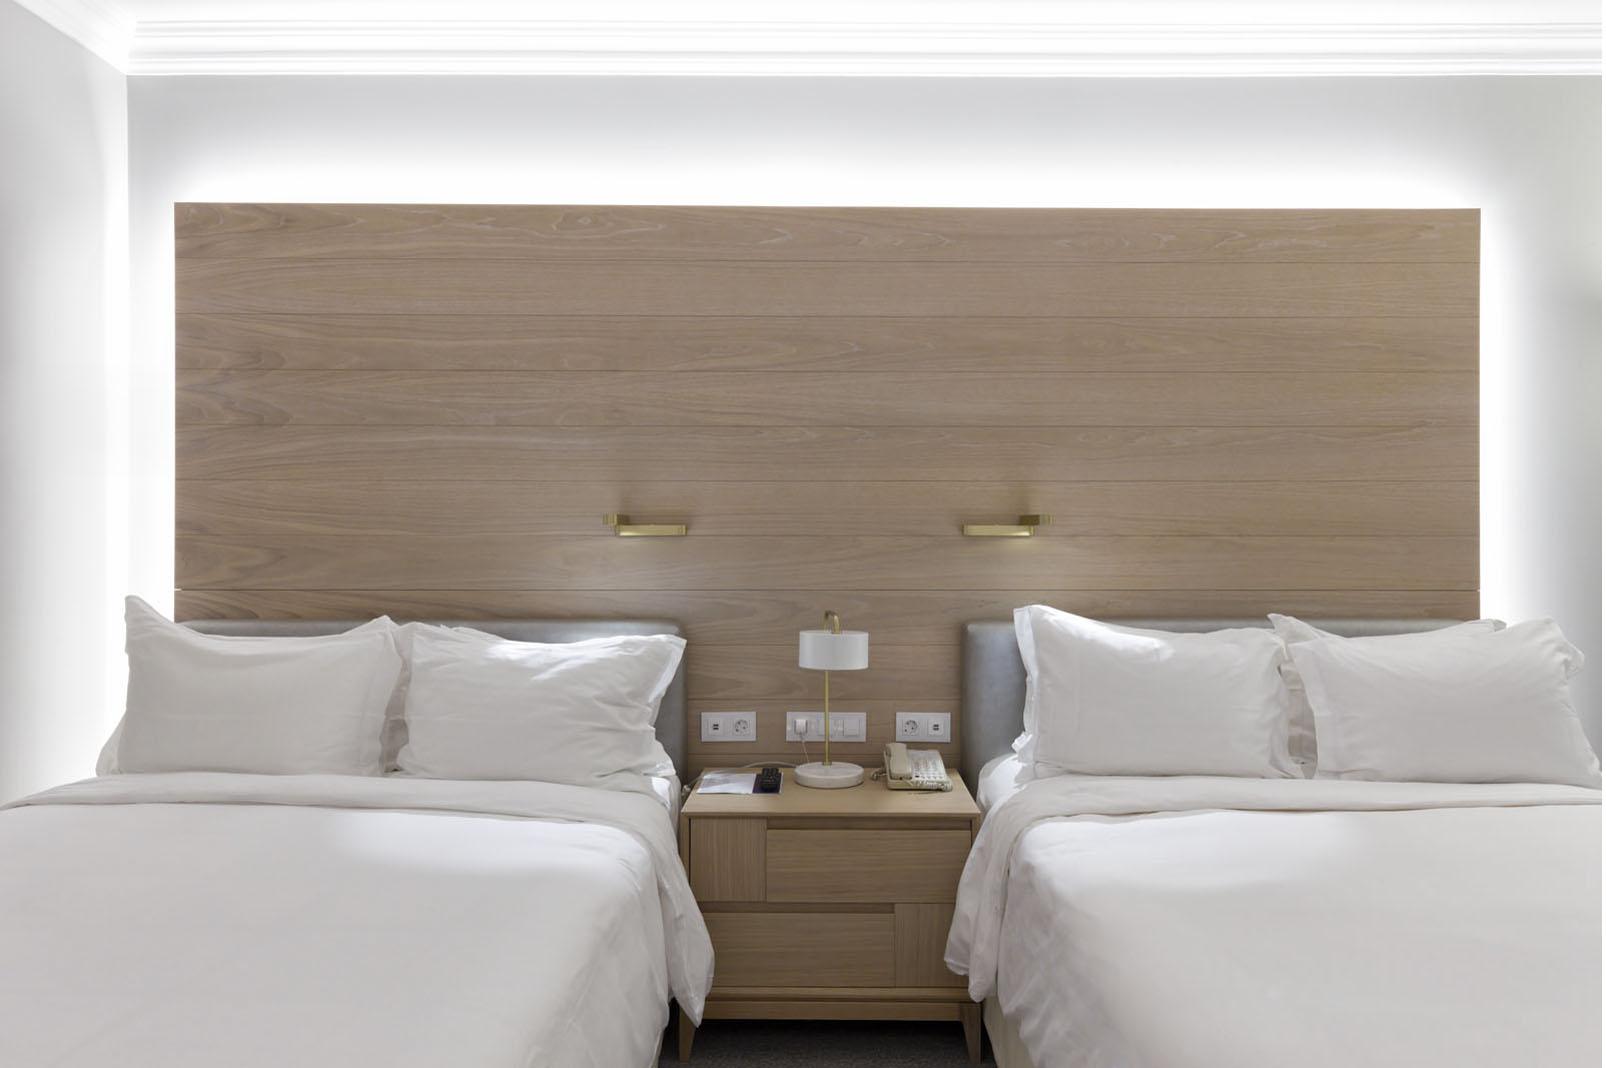 HotelMarriot_20170309_0291 copy.jpg